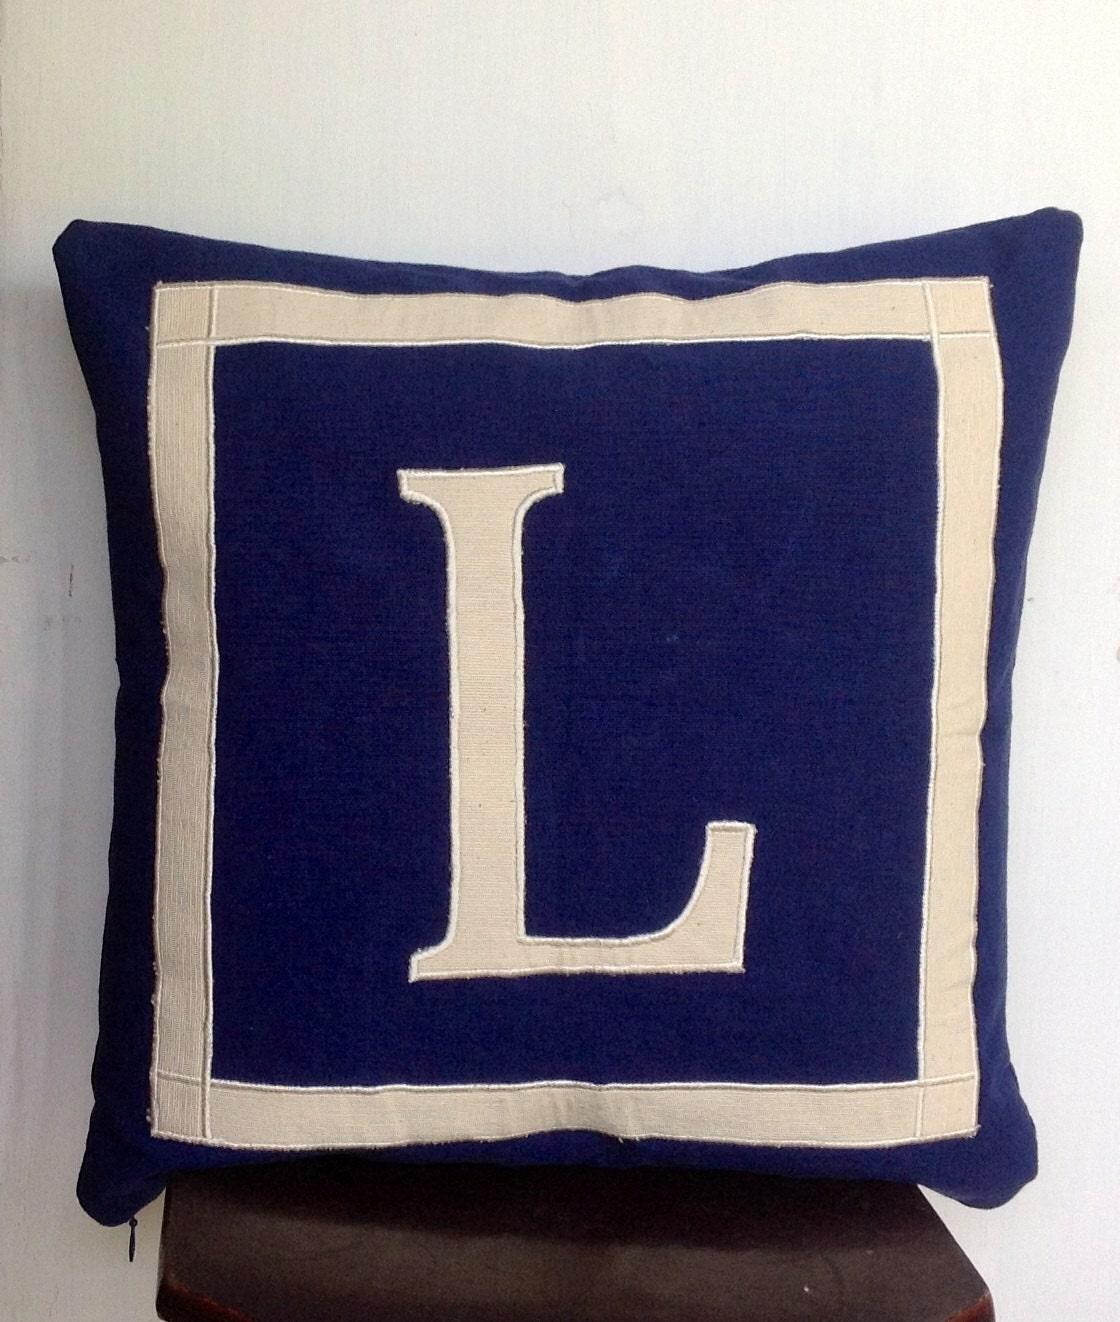 Monogram A Pillow: 30% OFF Unique Gift Ideas For Women Monogram Pillows 18